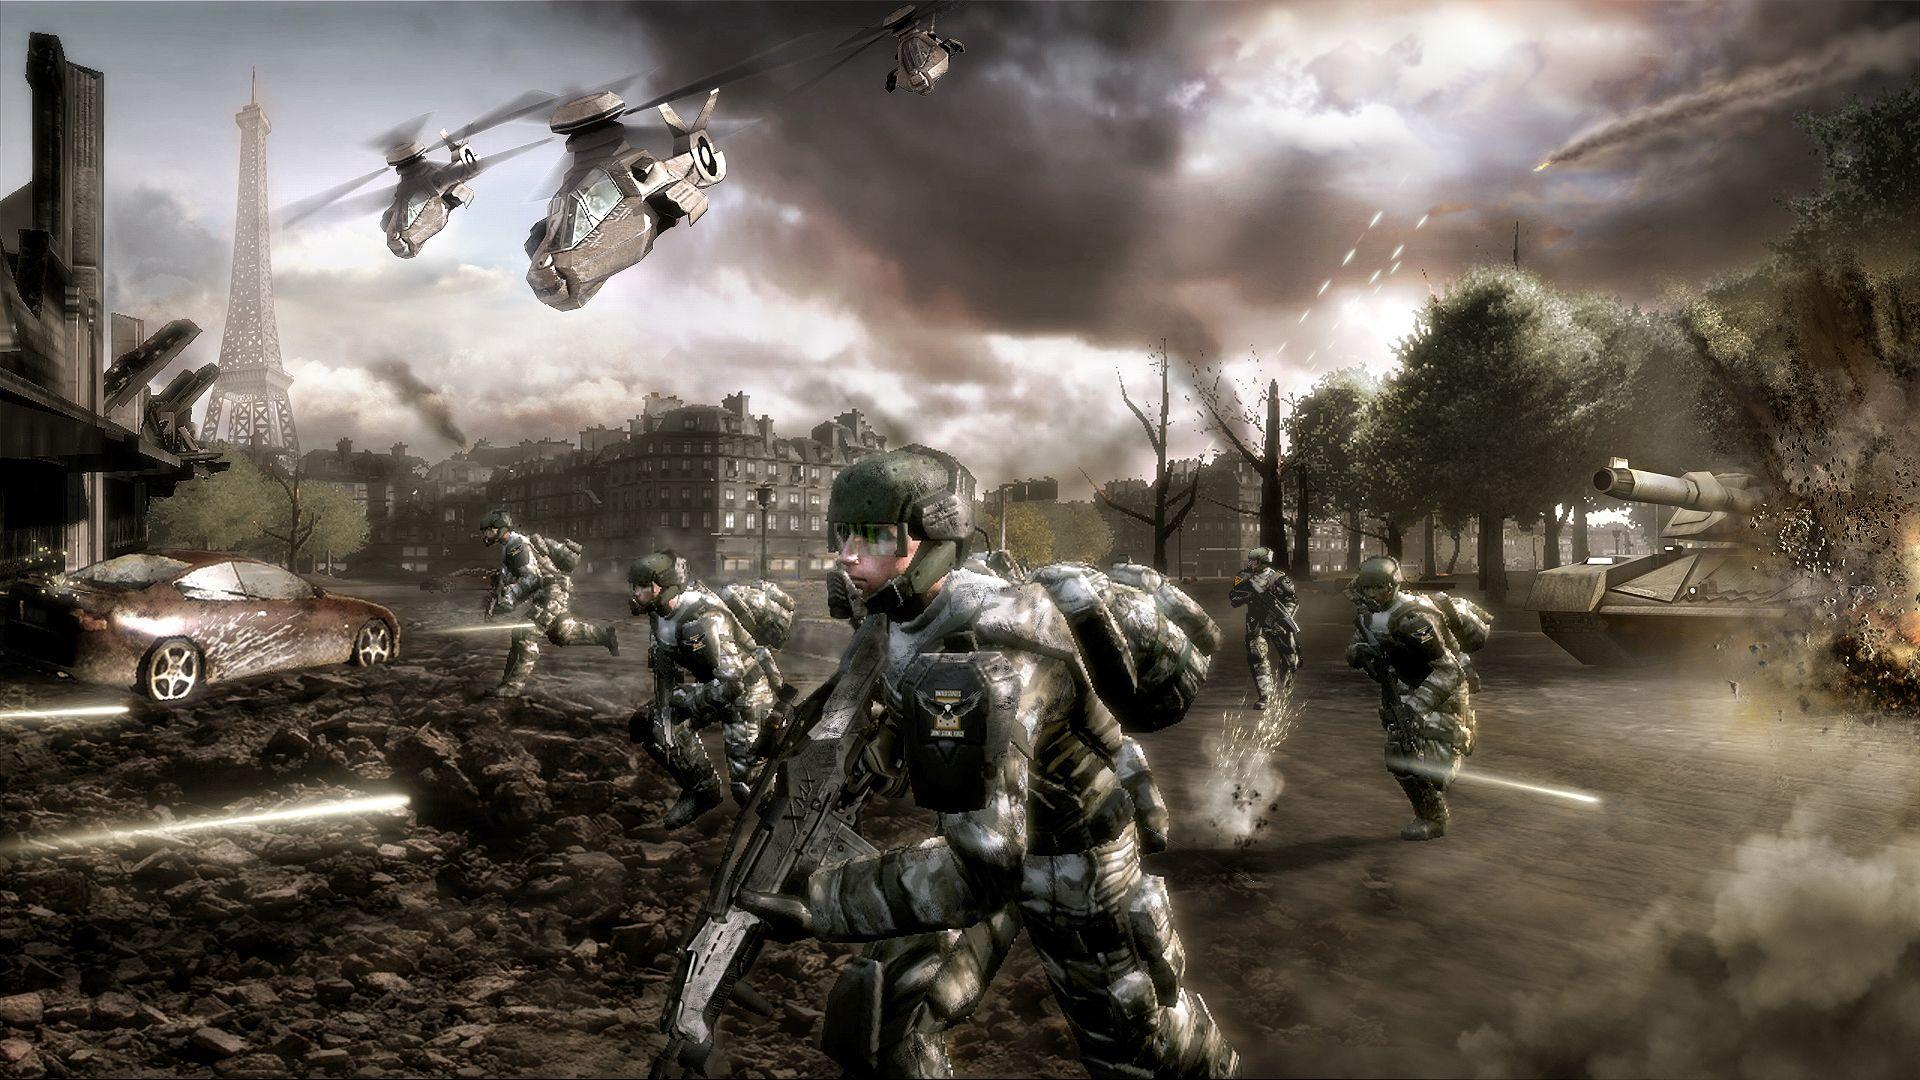 Hd wallpaper 3 tom clancy s endwar online - Buy Tom Clancy S Endwar Downloadtom Clancy S Endwar Download